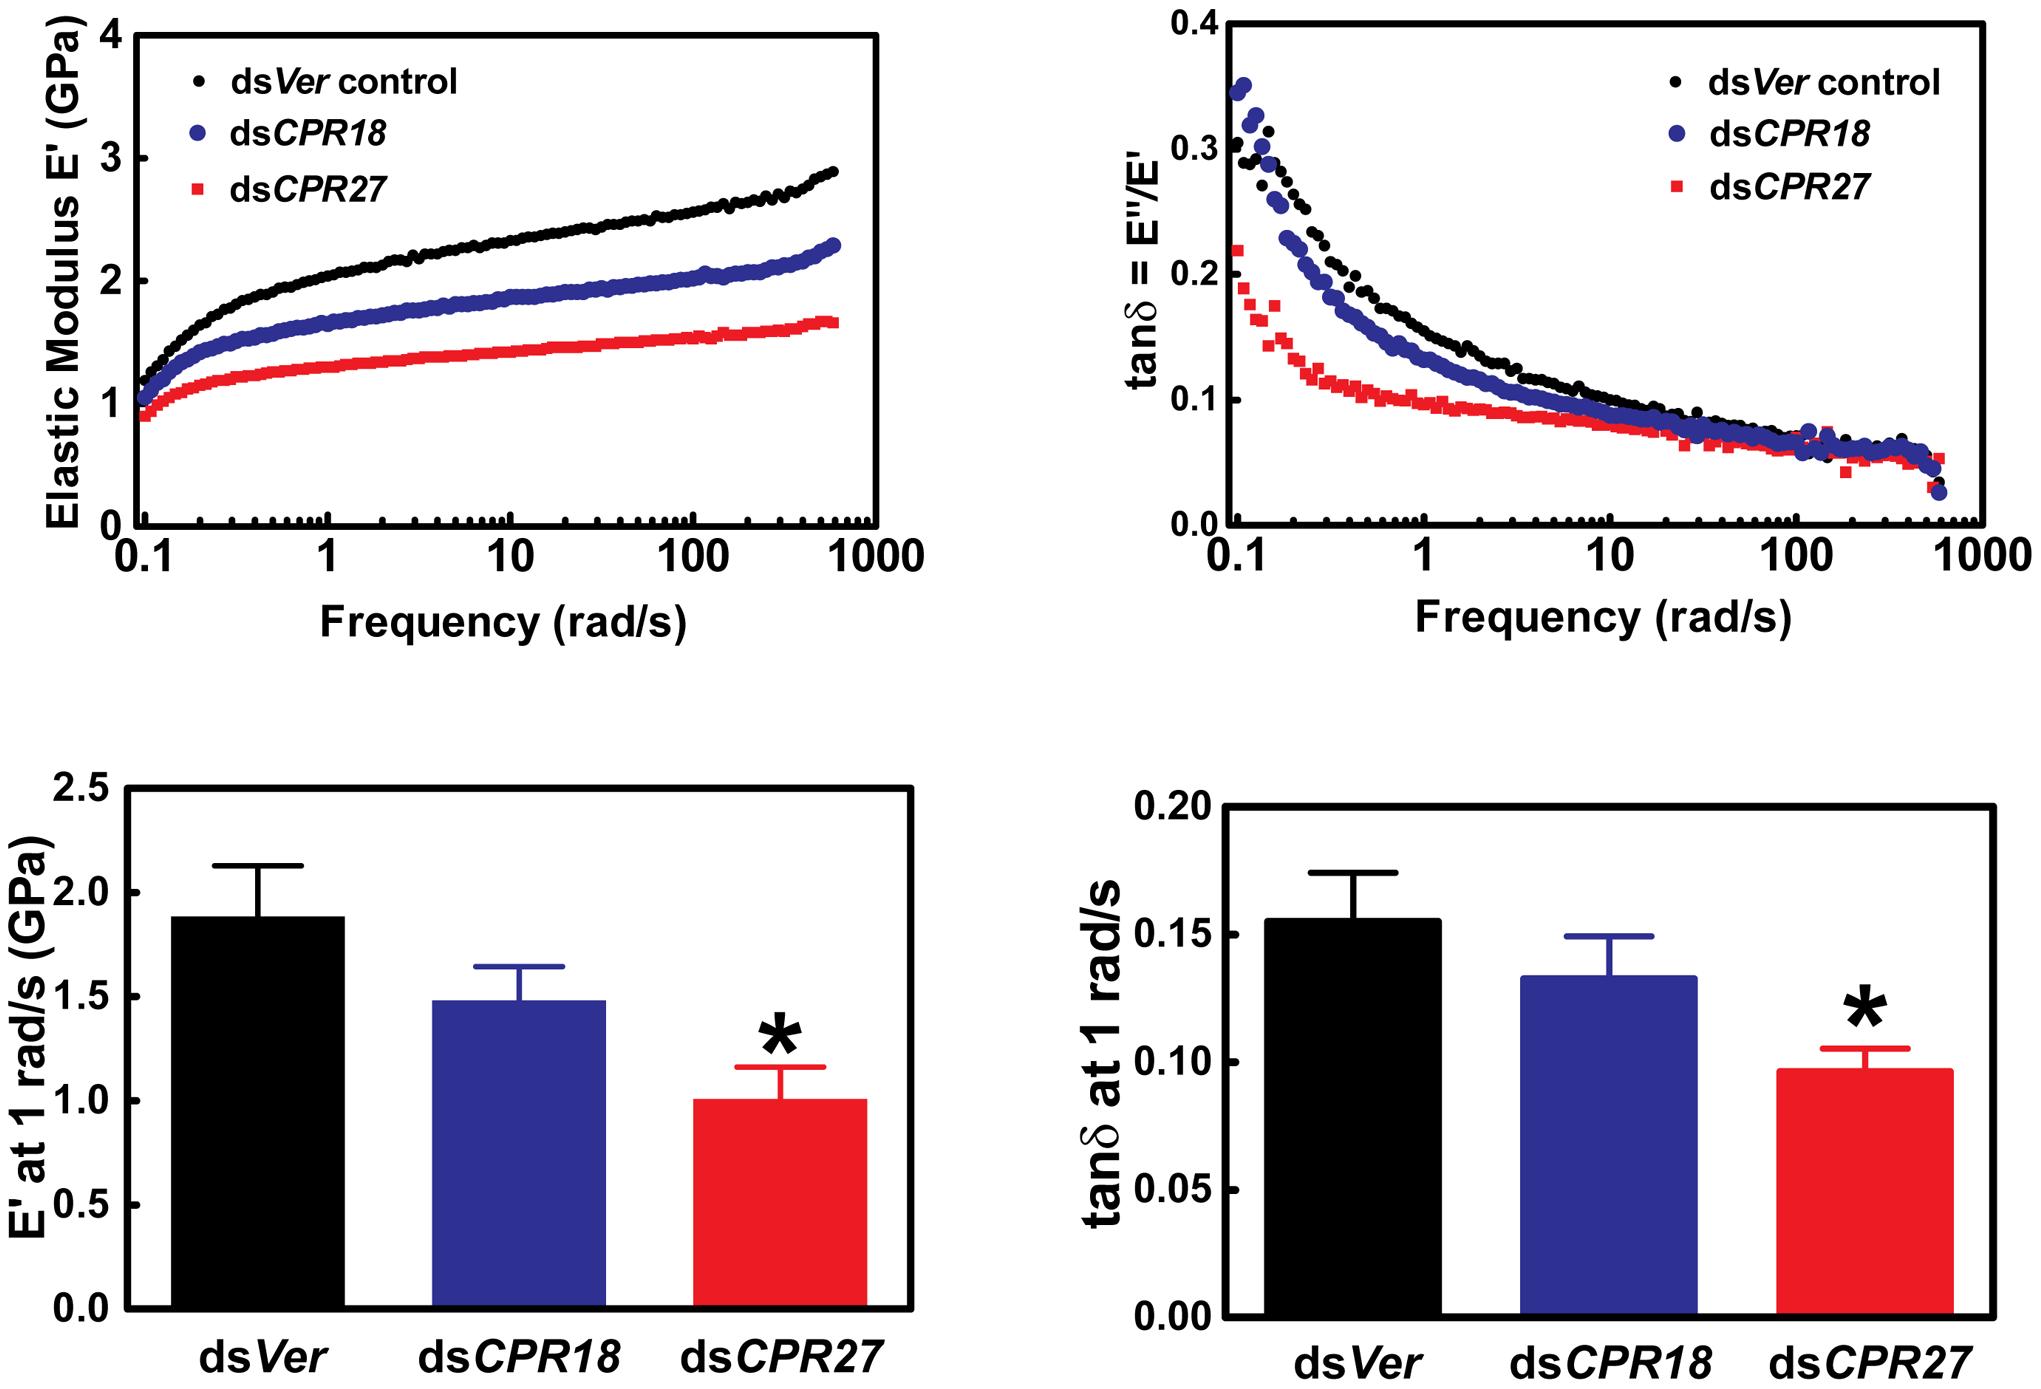 Mechanical properties of <i>Tribolium</i> ds<i>TcCPR27</i> and ds<i>TcCPR18</i> elytra.